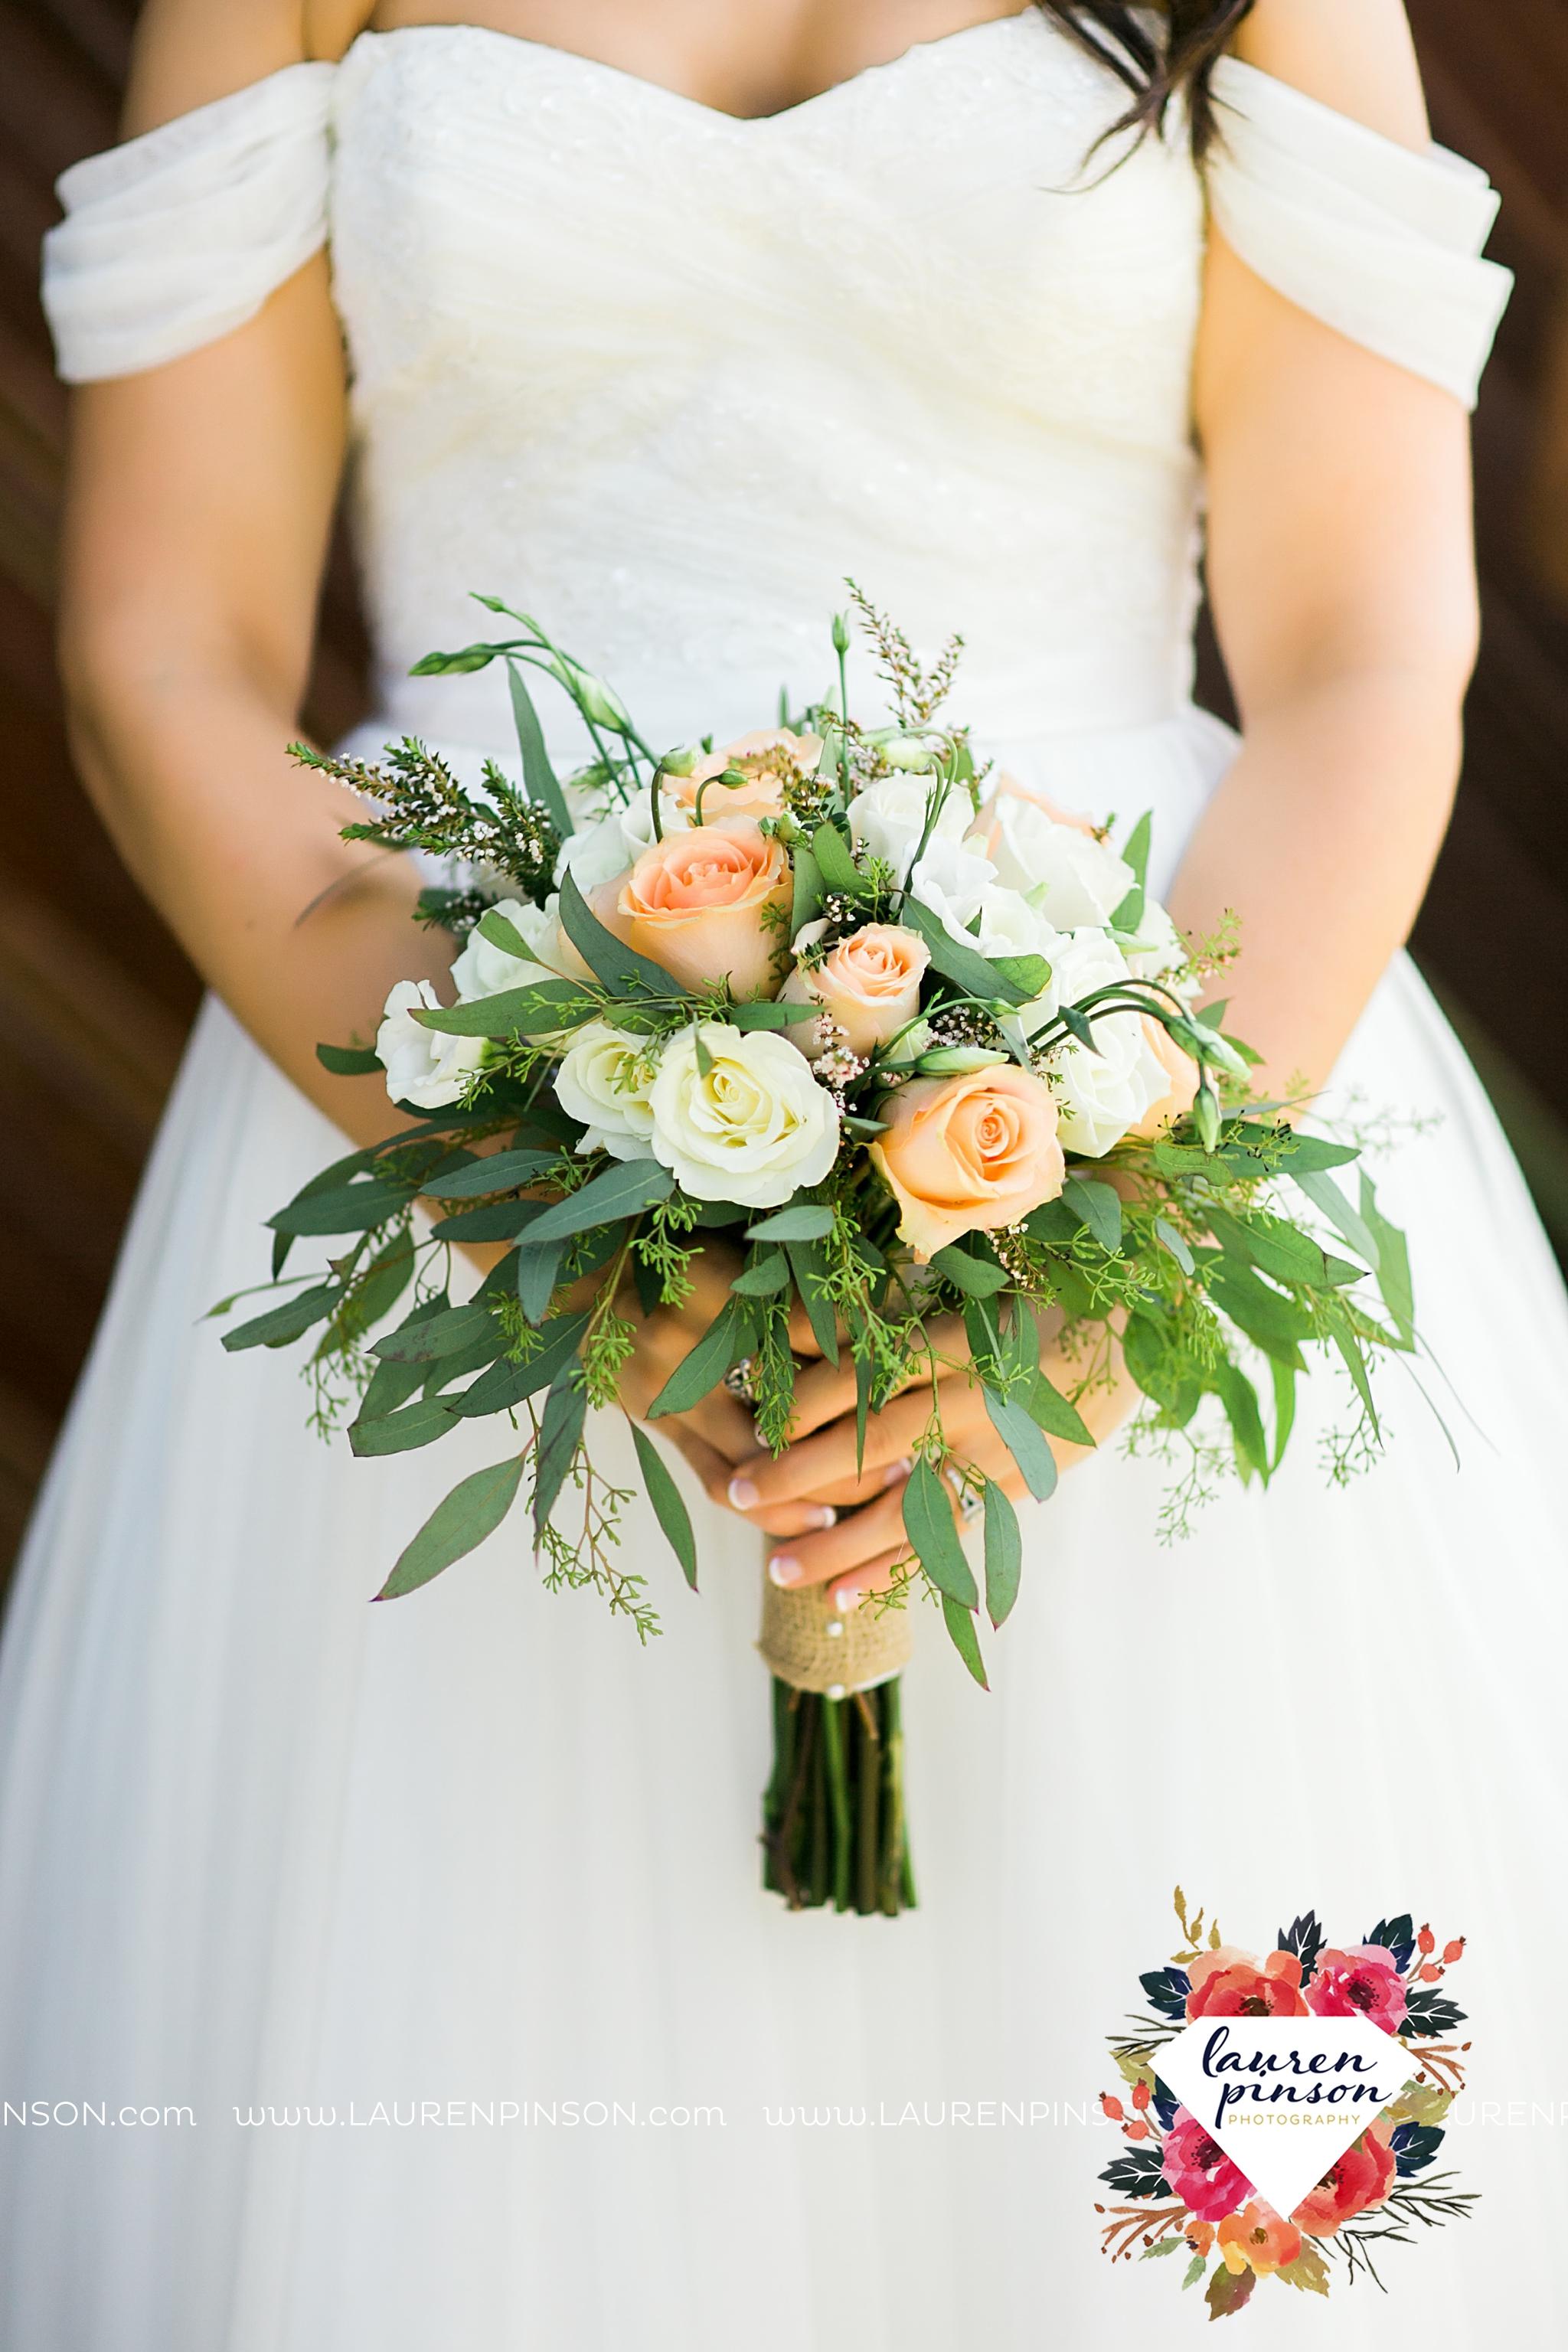 jones-barn-willow-creek-ranch-wedding-in-cleburne-texas-fort-worth-dfw-wichita-falls-wedding-photography_3209.jpg